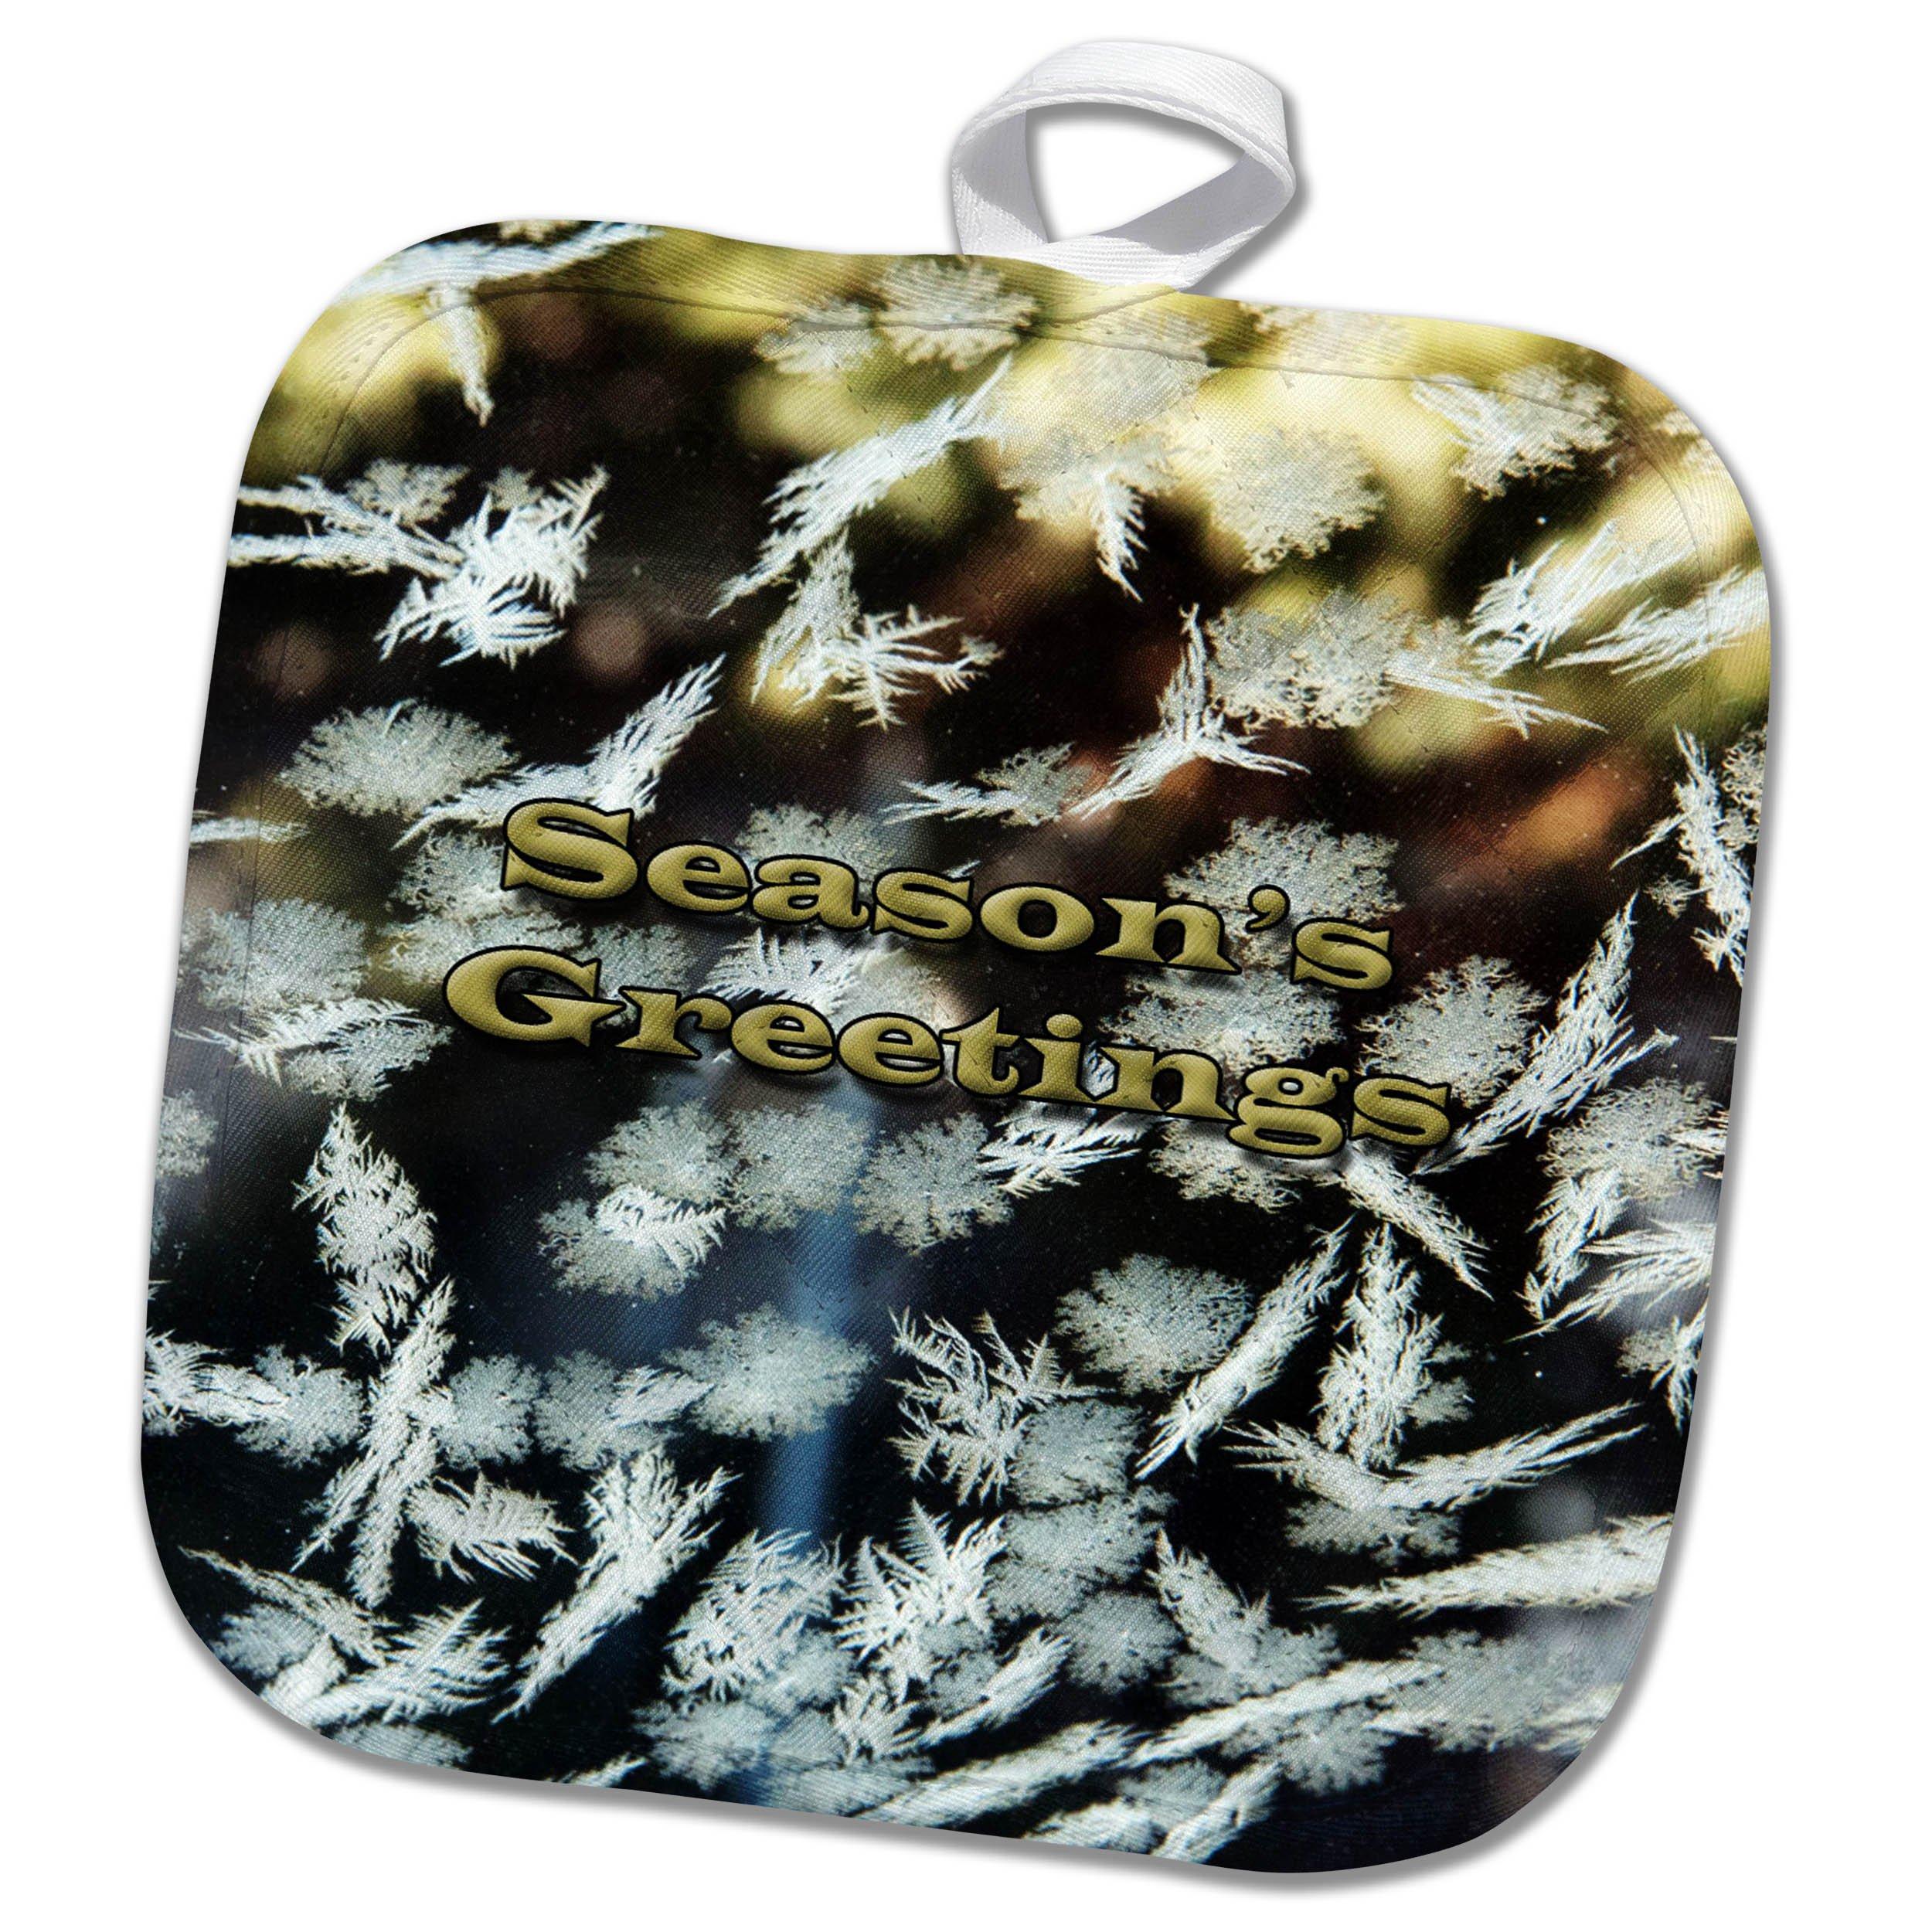 3dRose Jos Fauxtographee- Seasons Greetings - Seasons Greetings written on some snowflakes frozen to window - 8x8 Potholder (phl_263357_1)